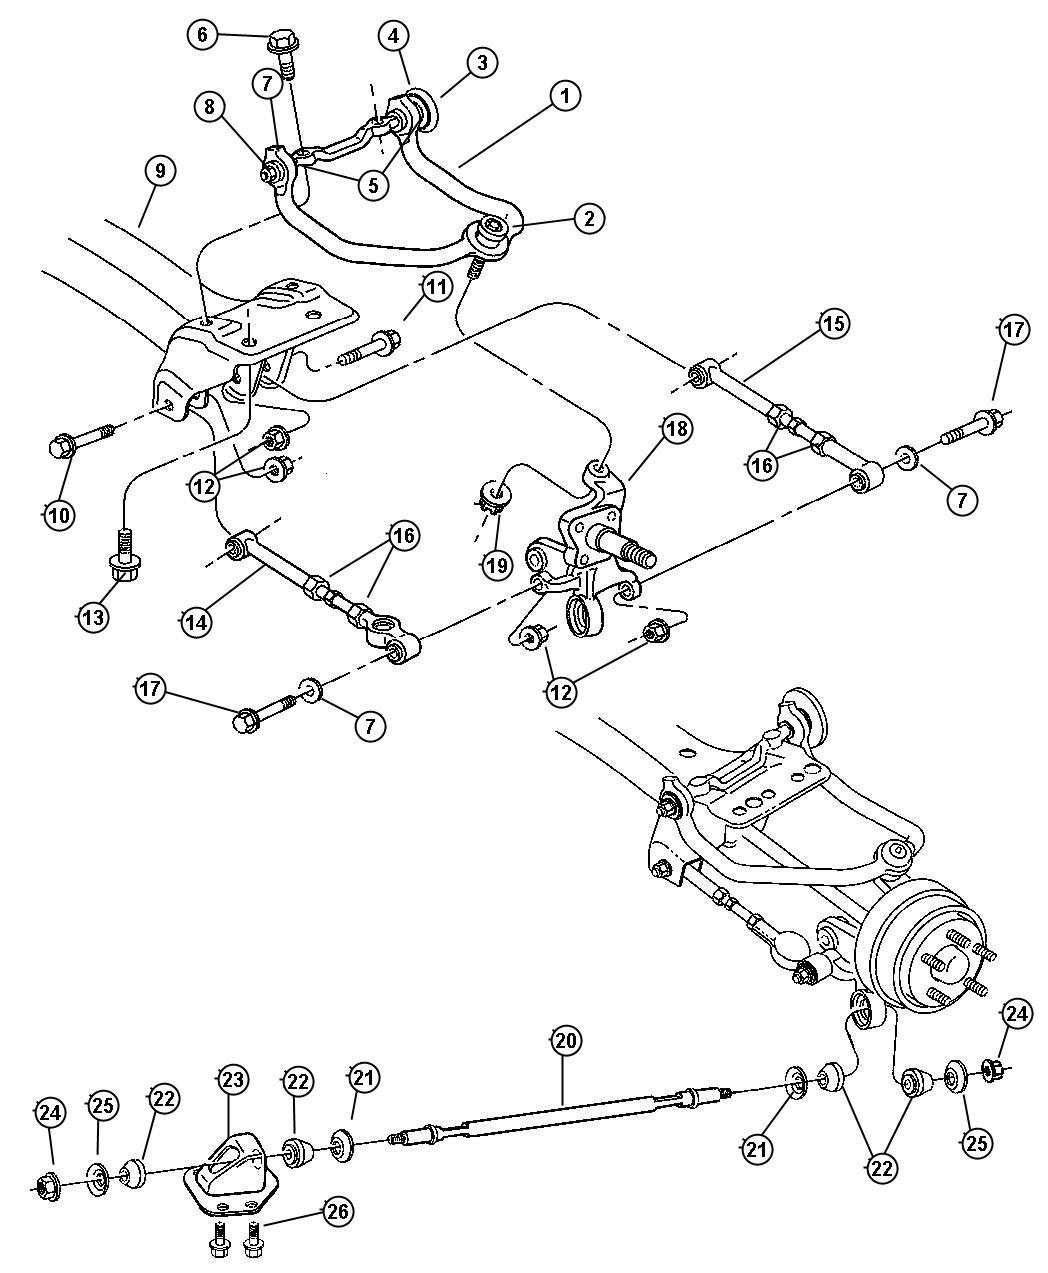 Dodge Stratus Crossmember Rear Suspension